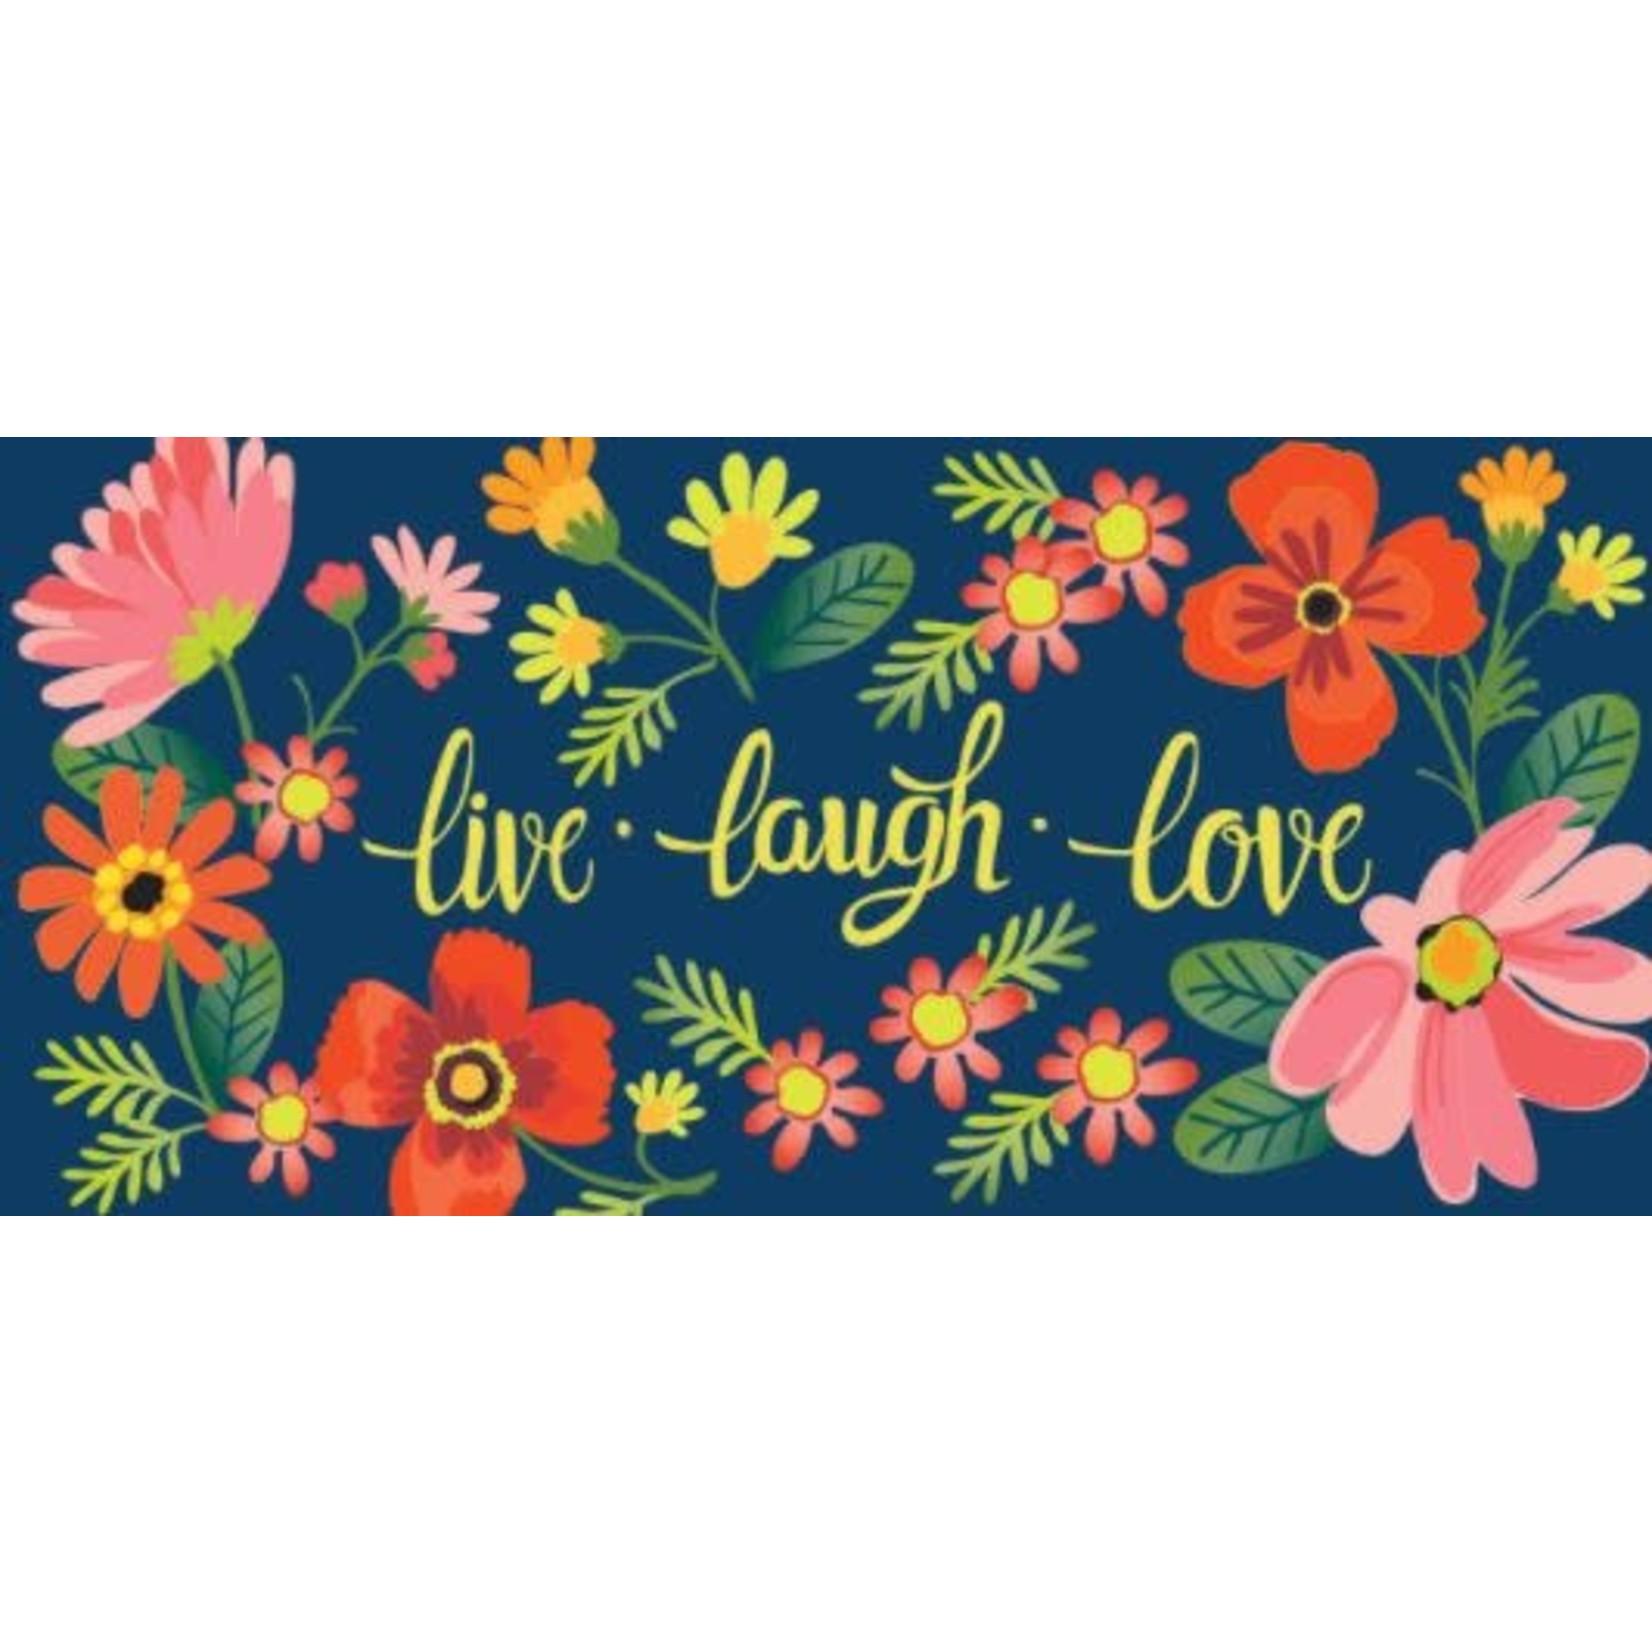 LIVE LAUGH LOVE FLORAL SASSAFRAS MAT